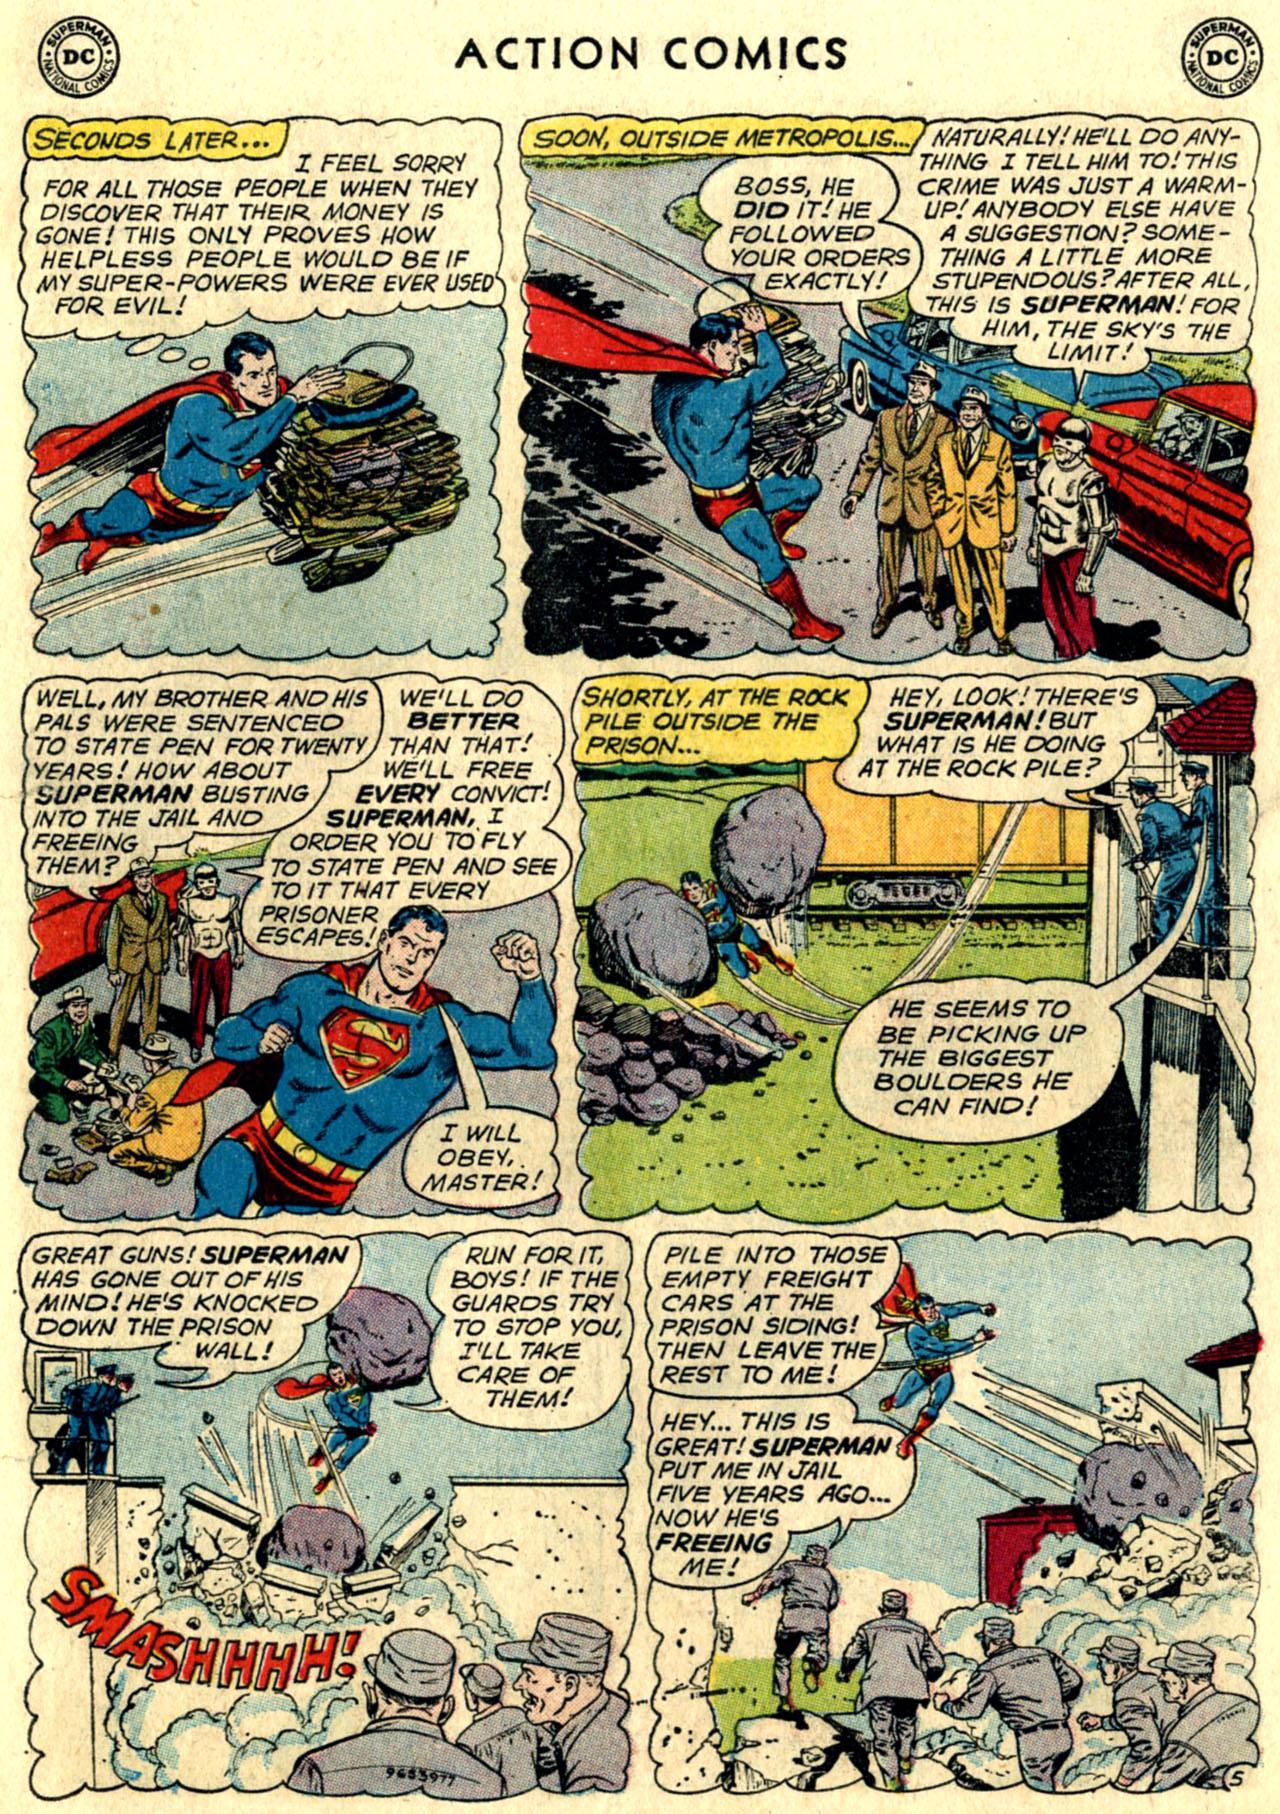 Action Comics (1938) 287 Page 6